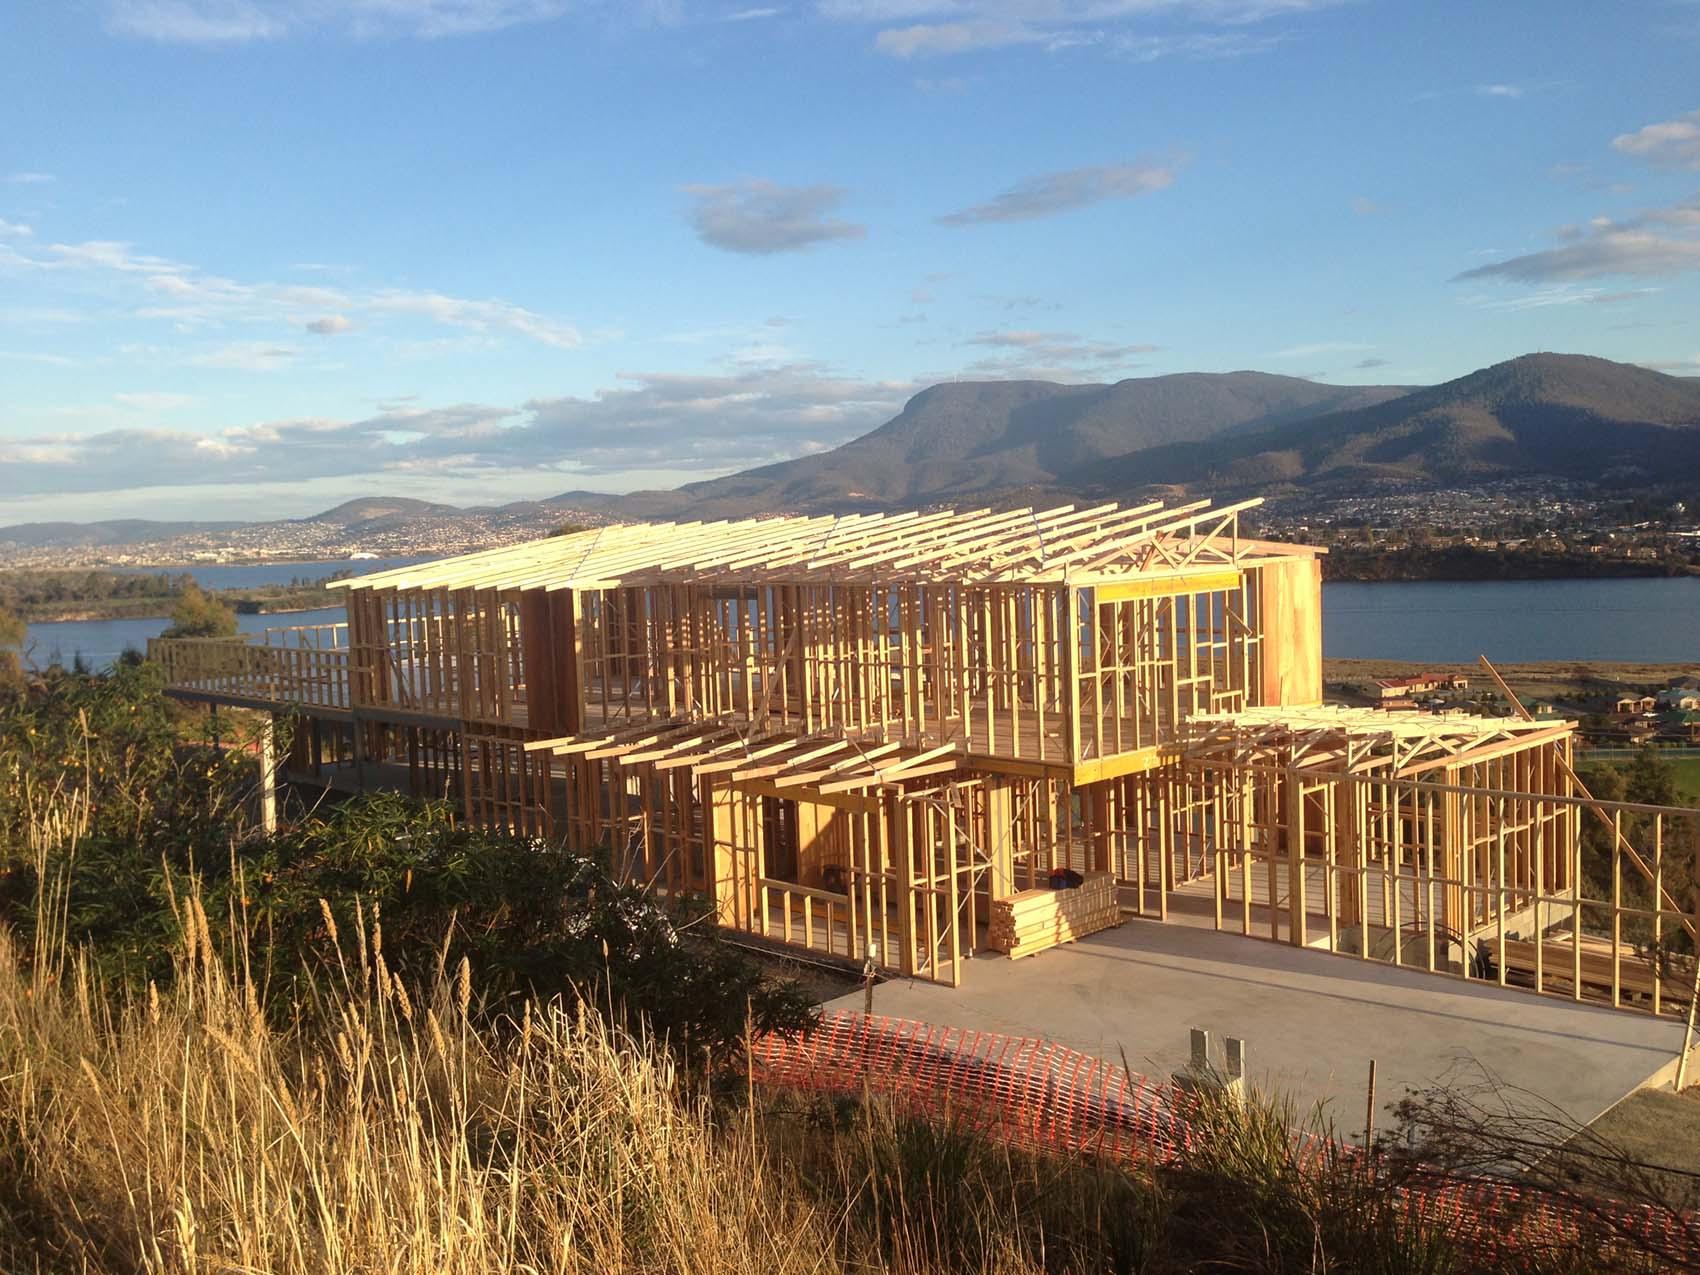 321-build-new-home-renovations-extension-hobart-tasmania-7